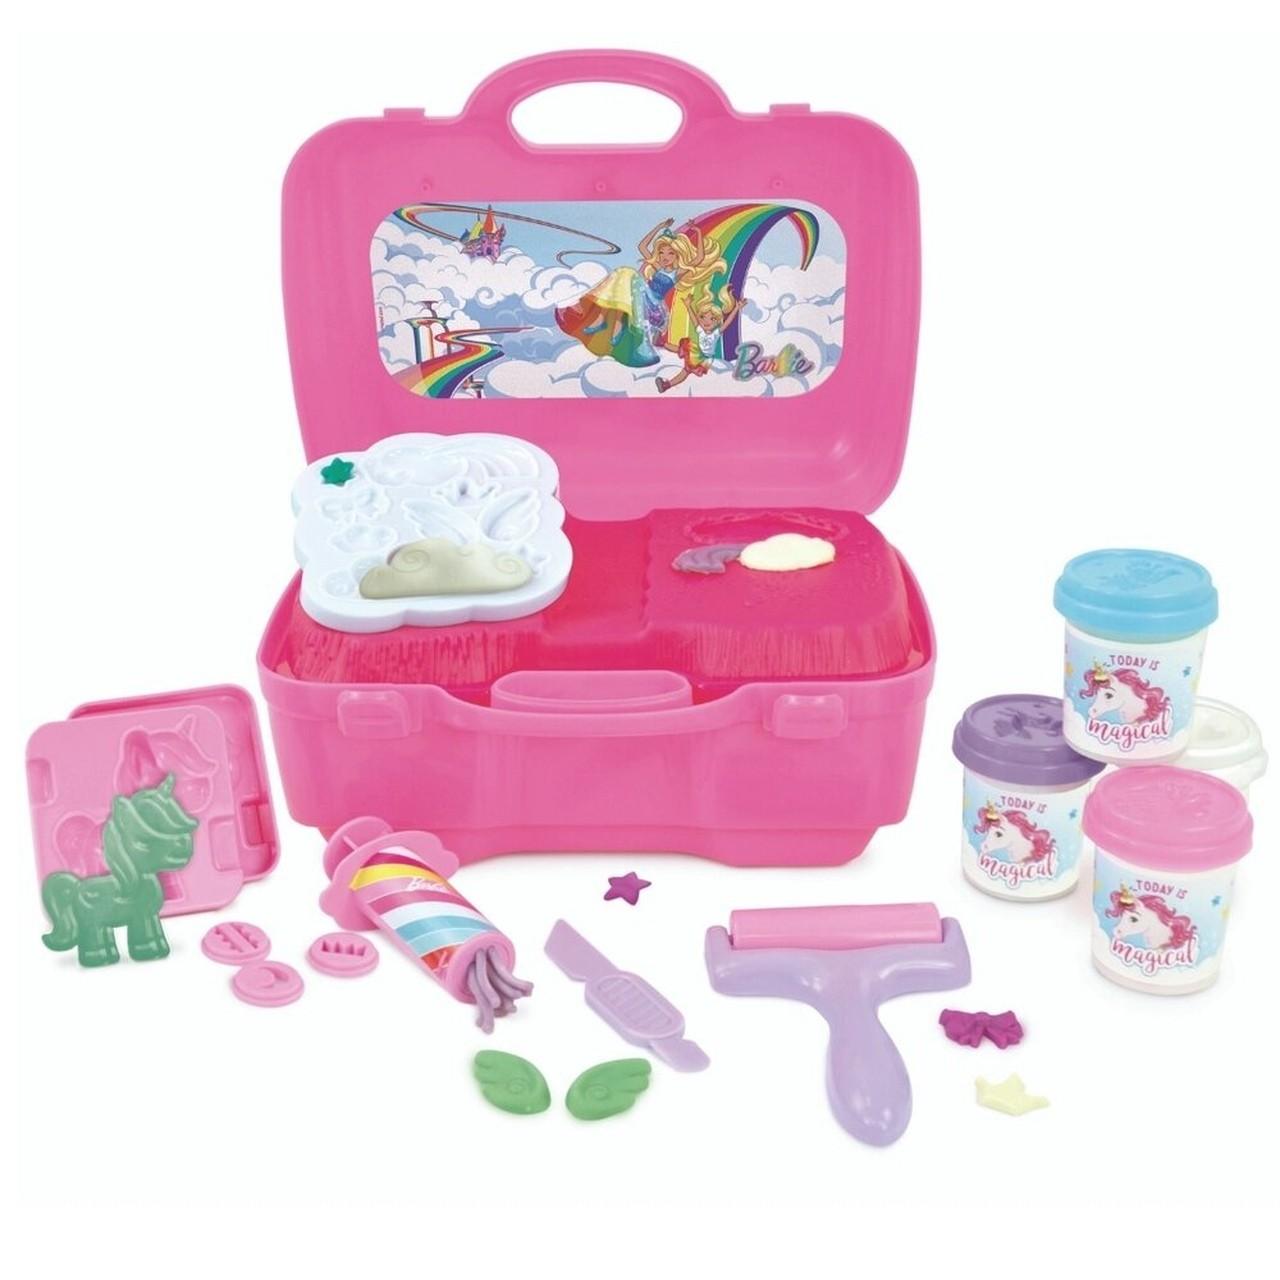 Barbie Maleta De Massinhas Dreamtopia - Fun 84261